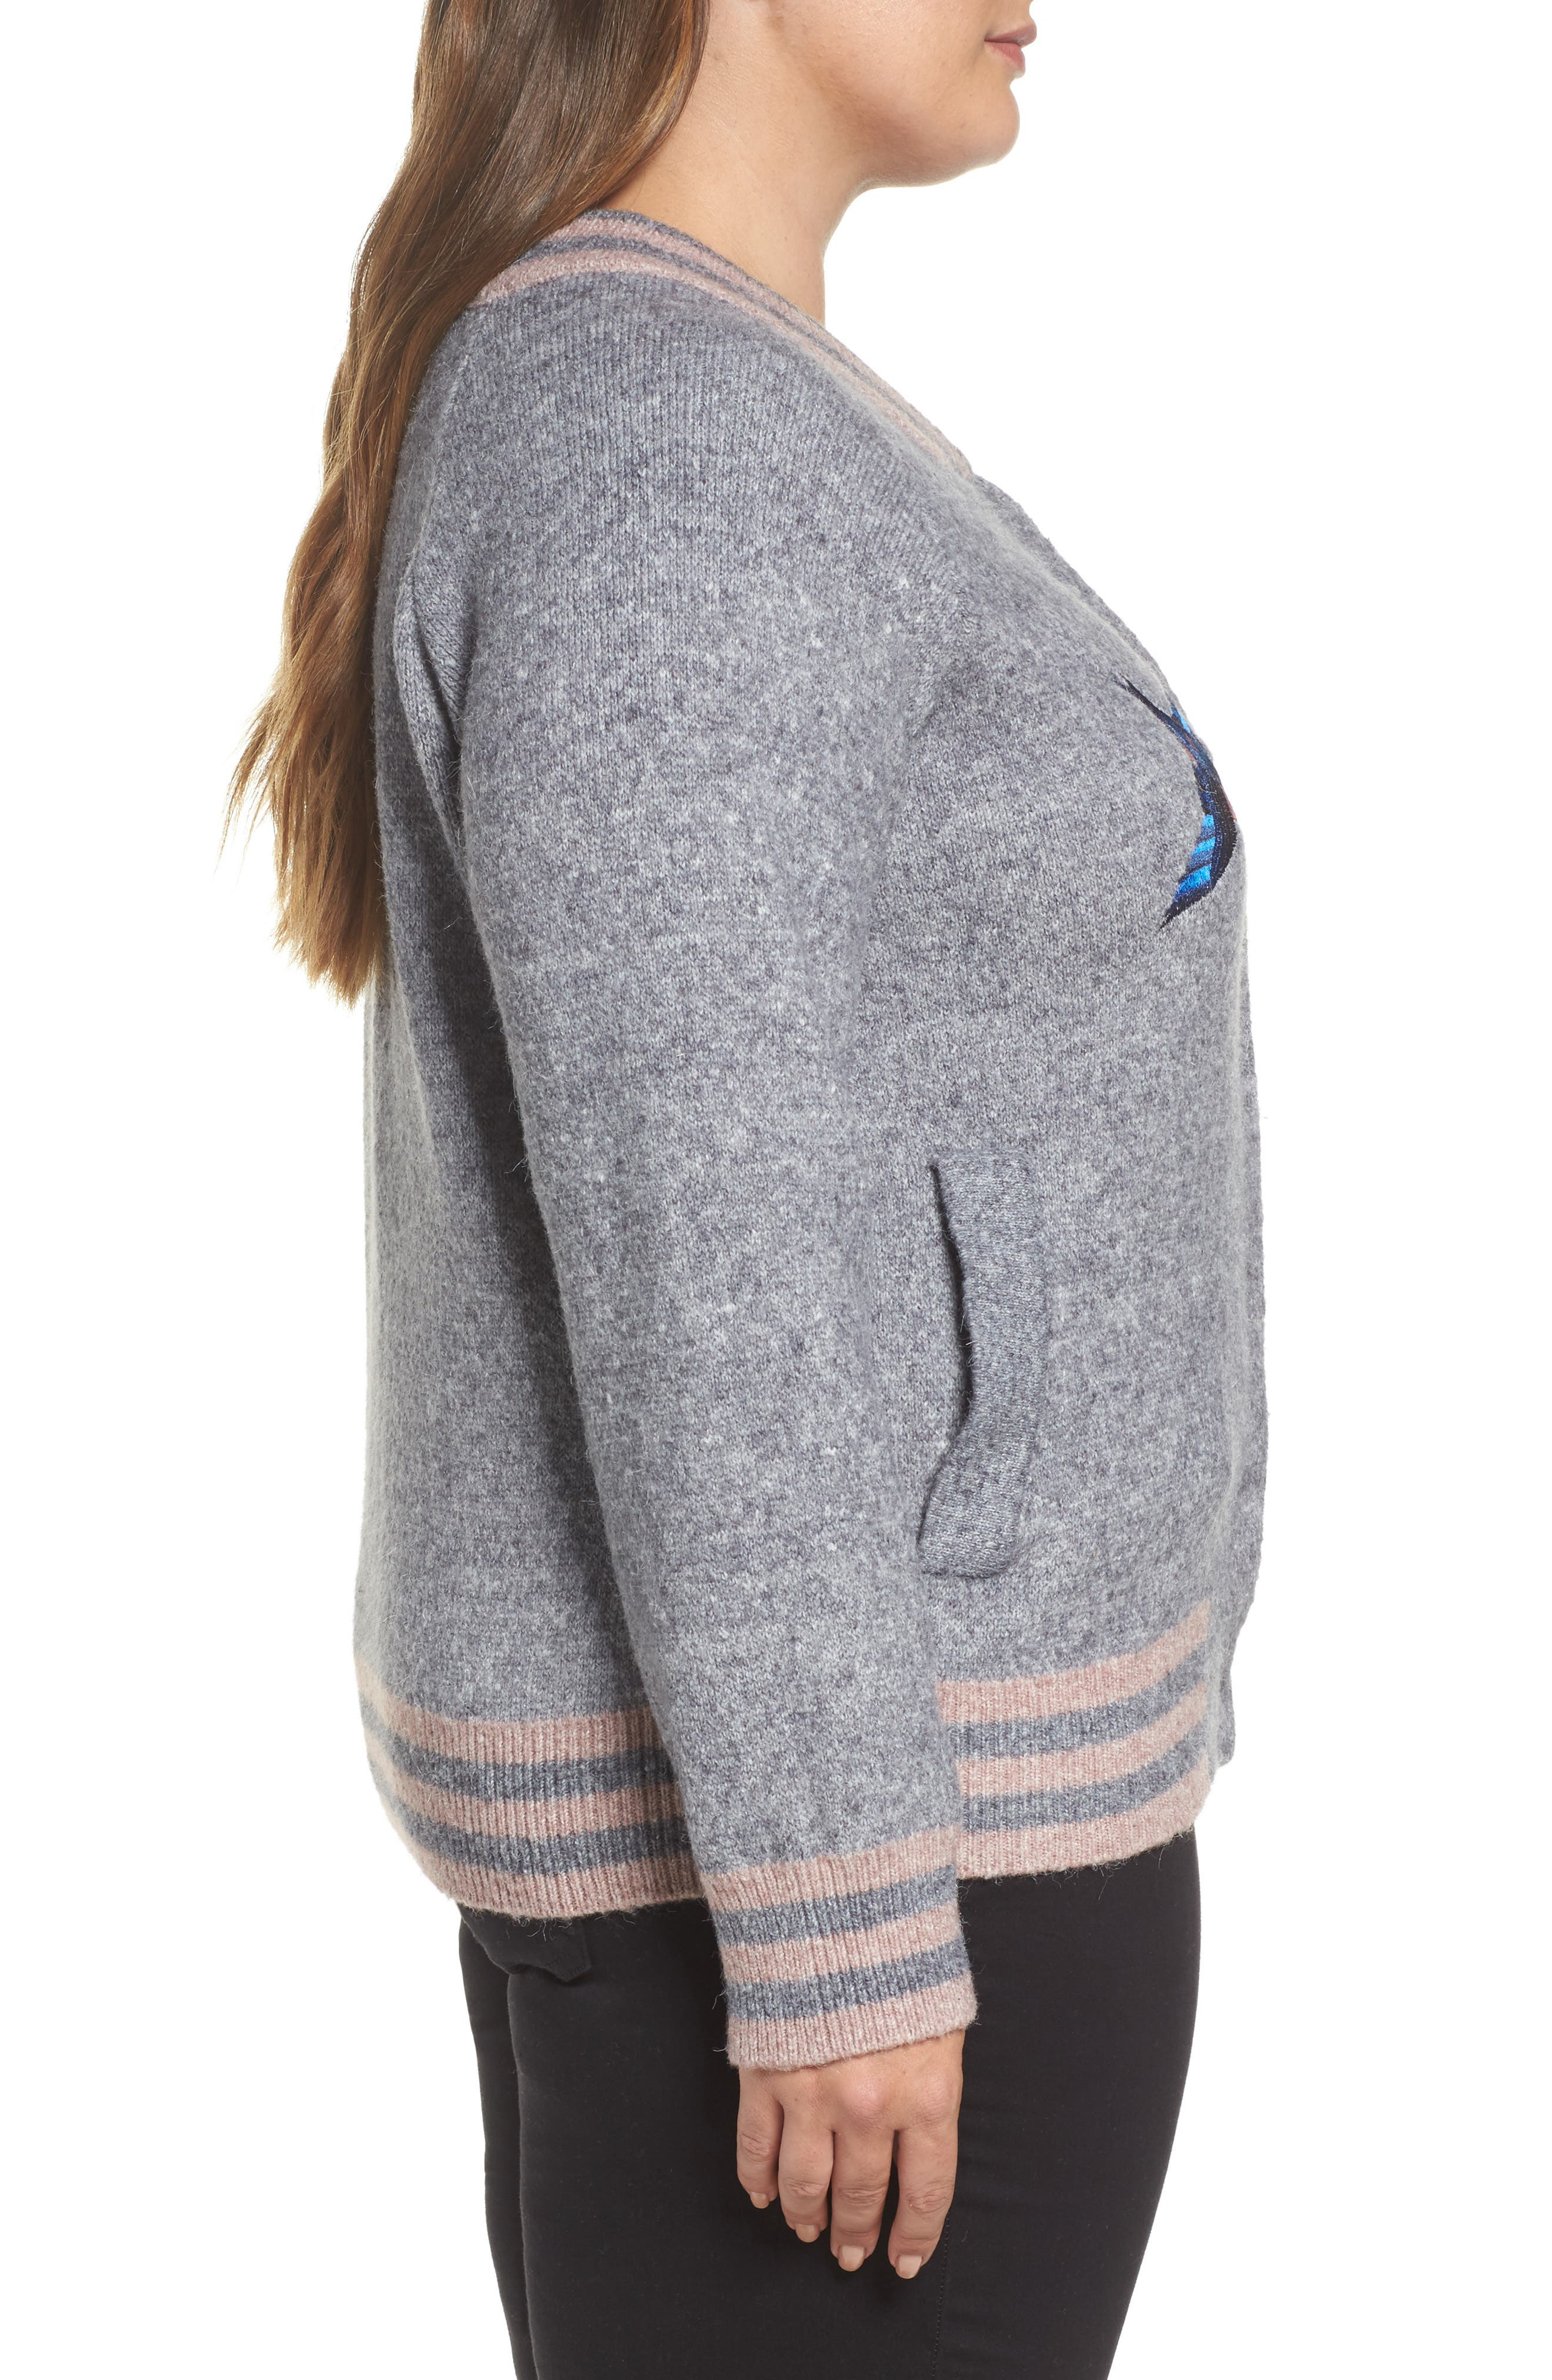 Zanja Embroidered Knit Bomber Jacket,                             Alternate thumbnail 3, color,                             Medium Grey Melange